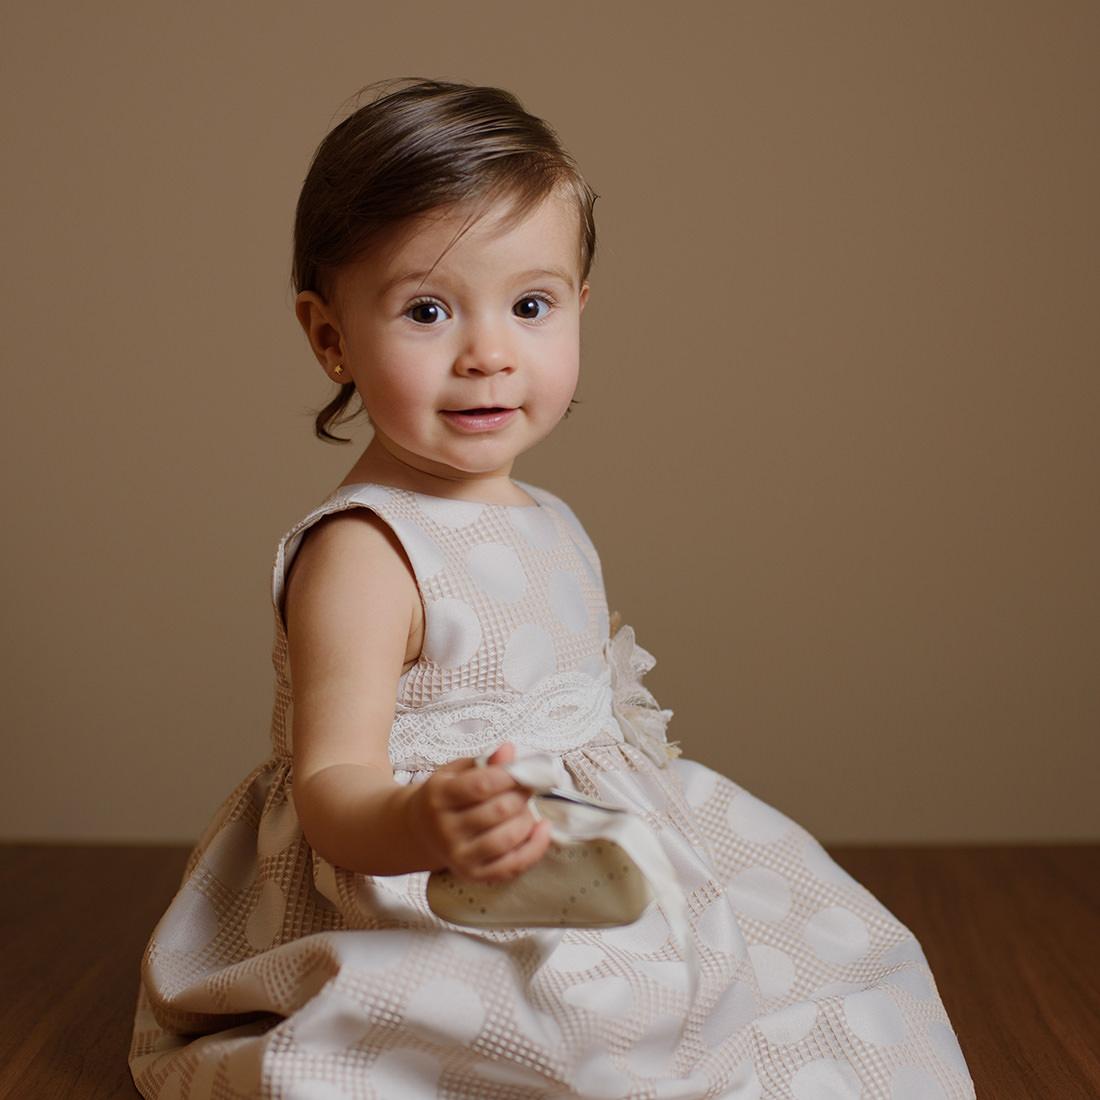 sesion de fotos para recordatorios de bautizo